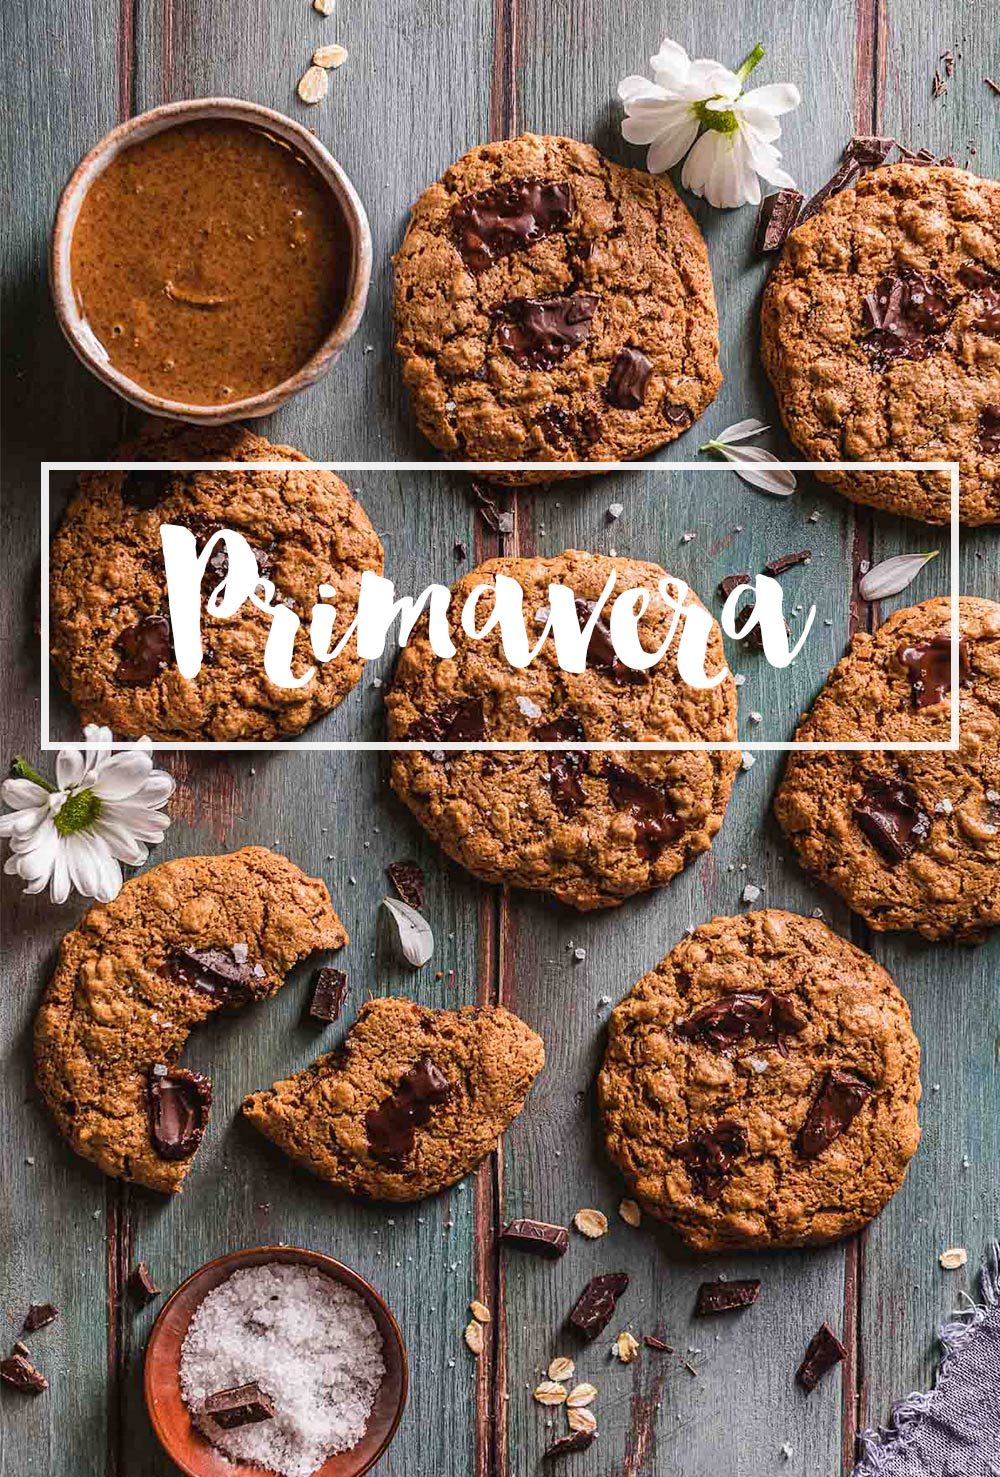 beauty food blog ricette vegan senza glutine Natale vegan